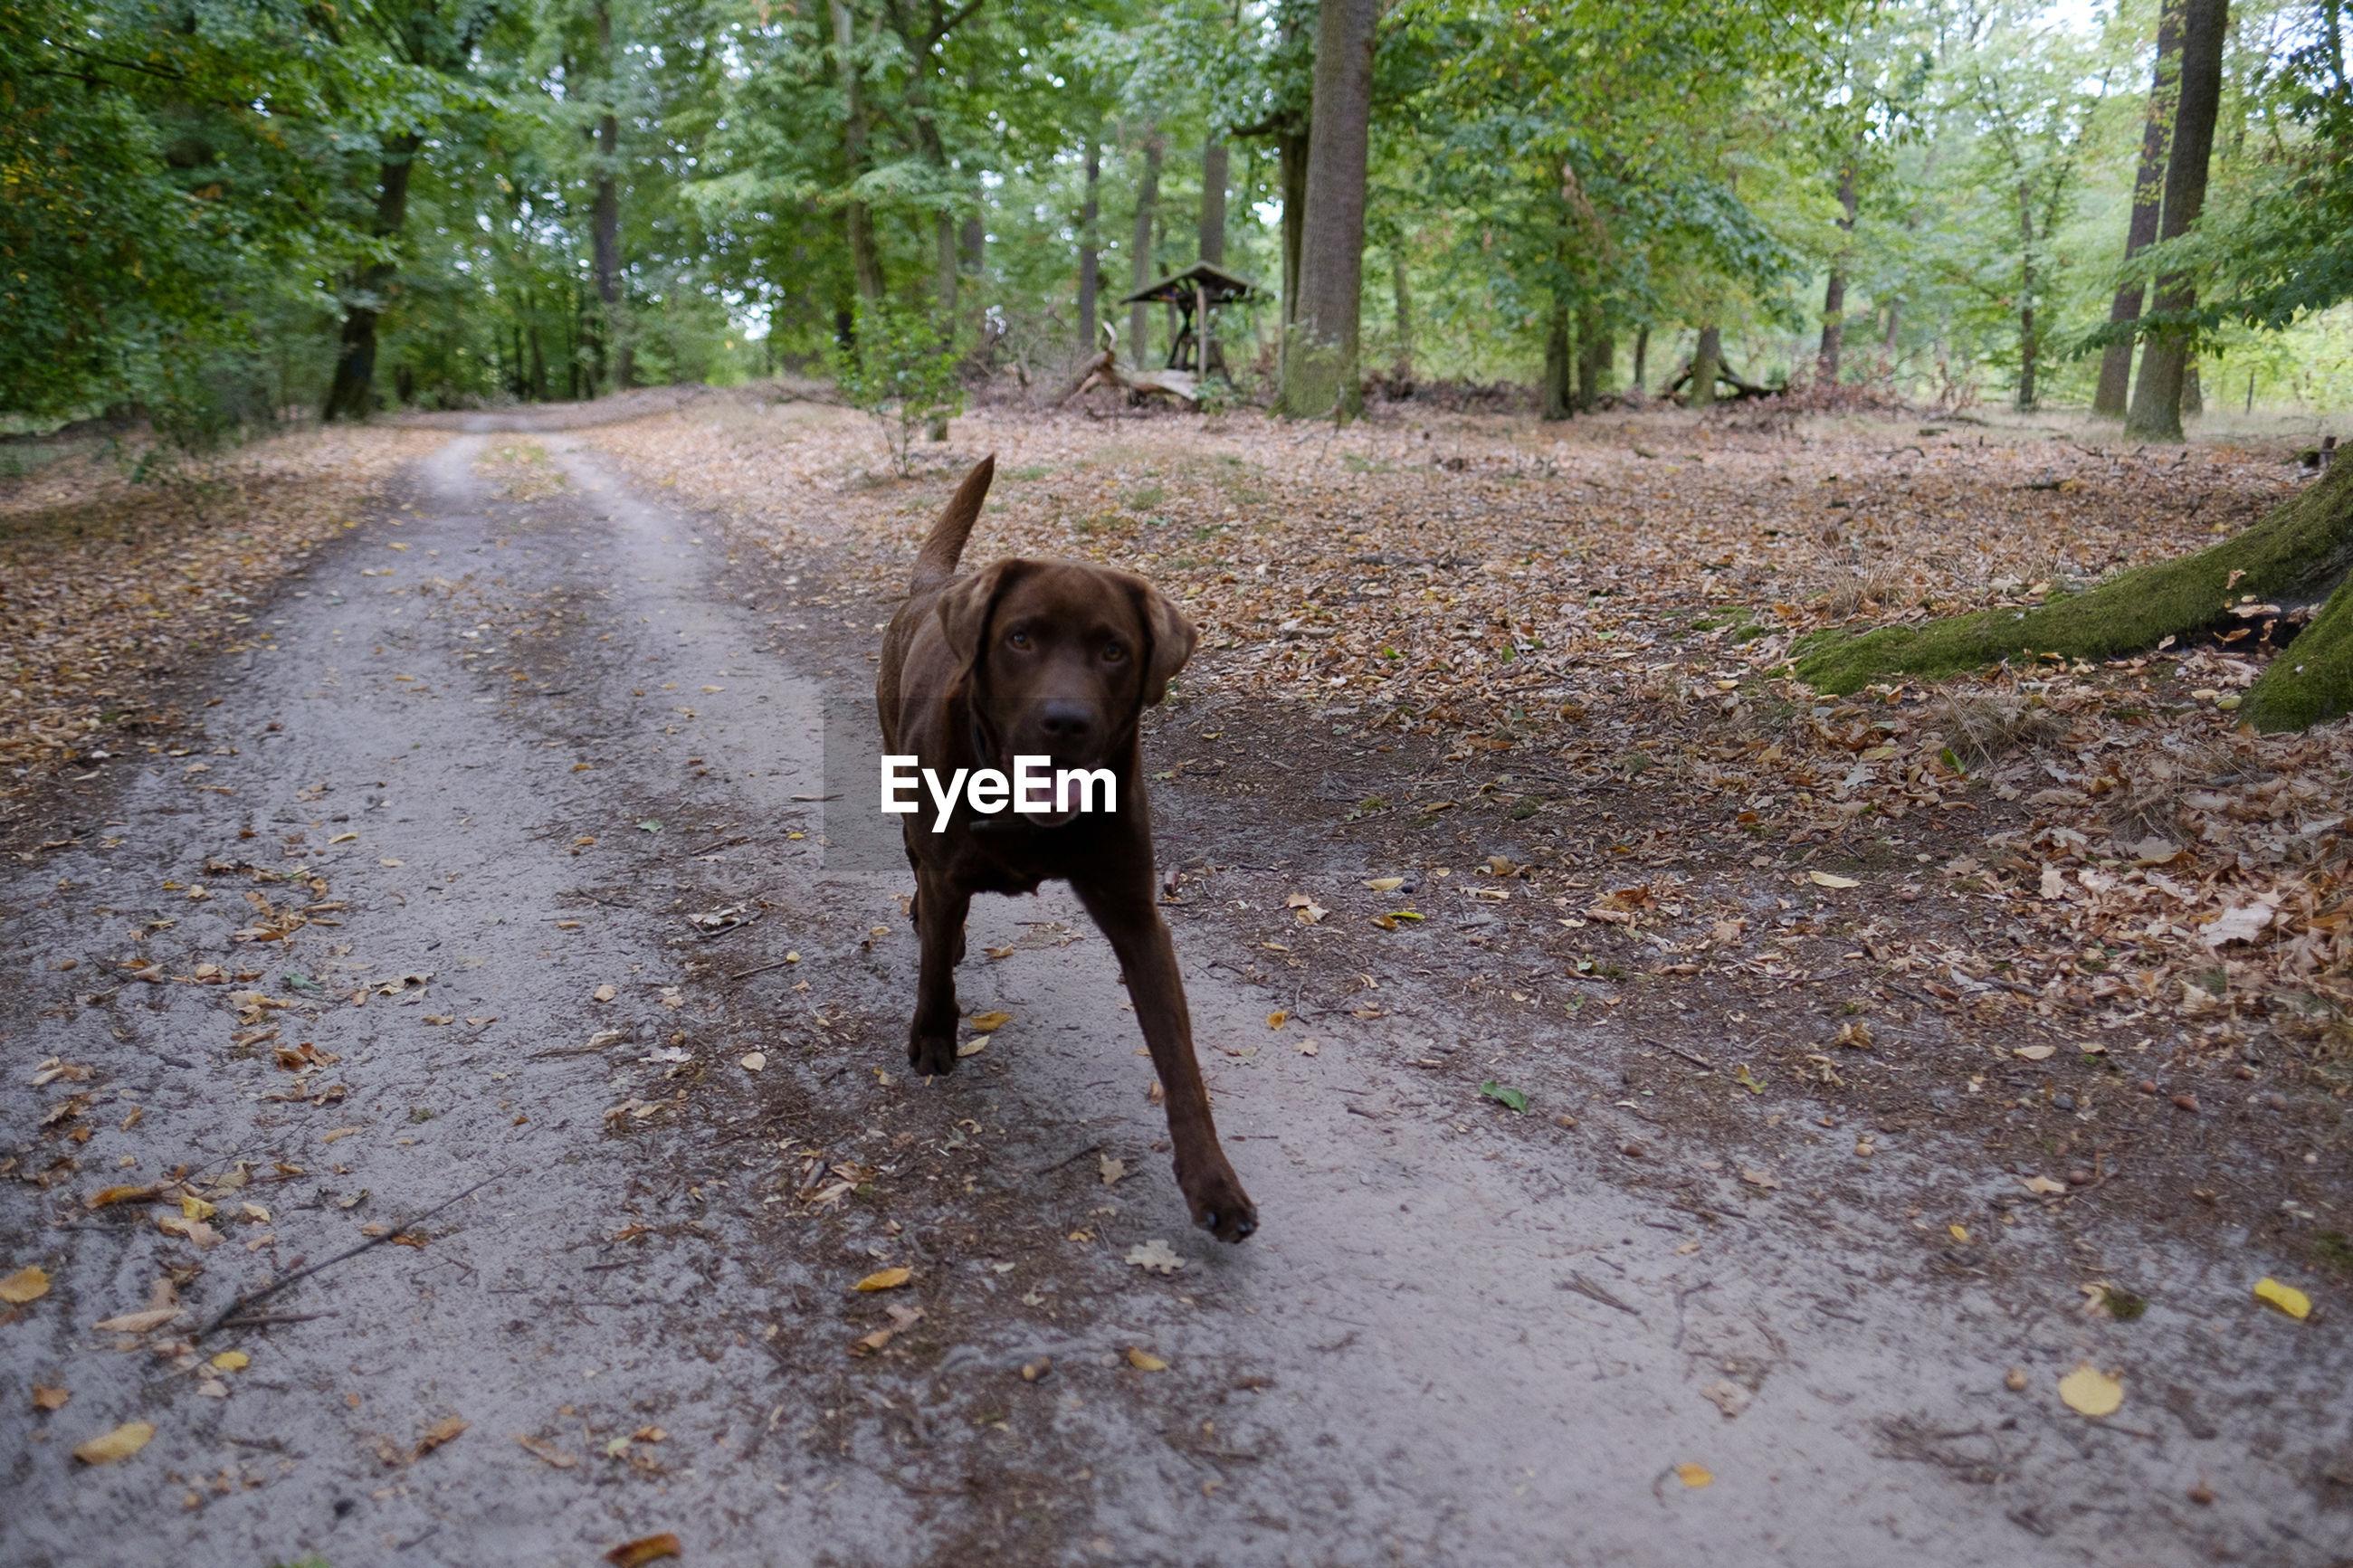 PORTRAIT OF DOG RUNNING ON DIRT ROAD